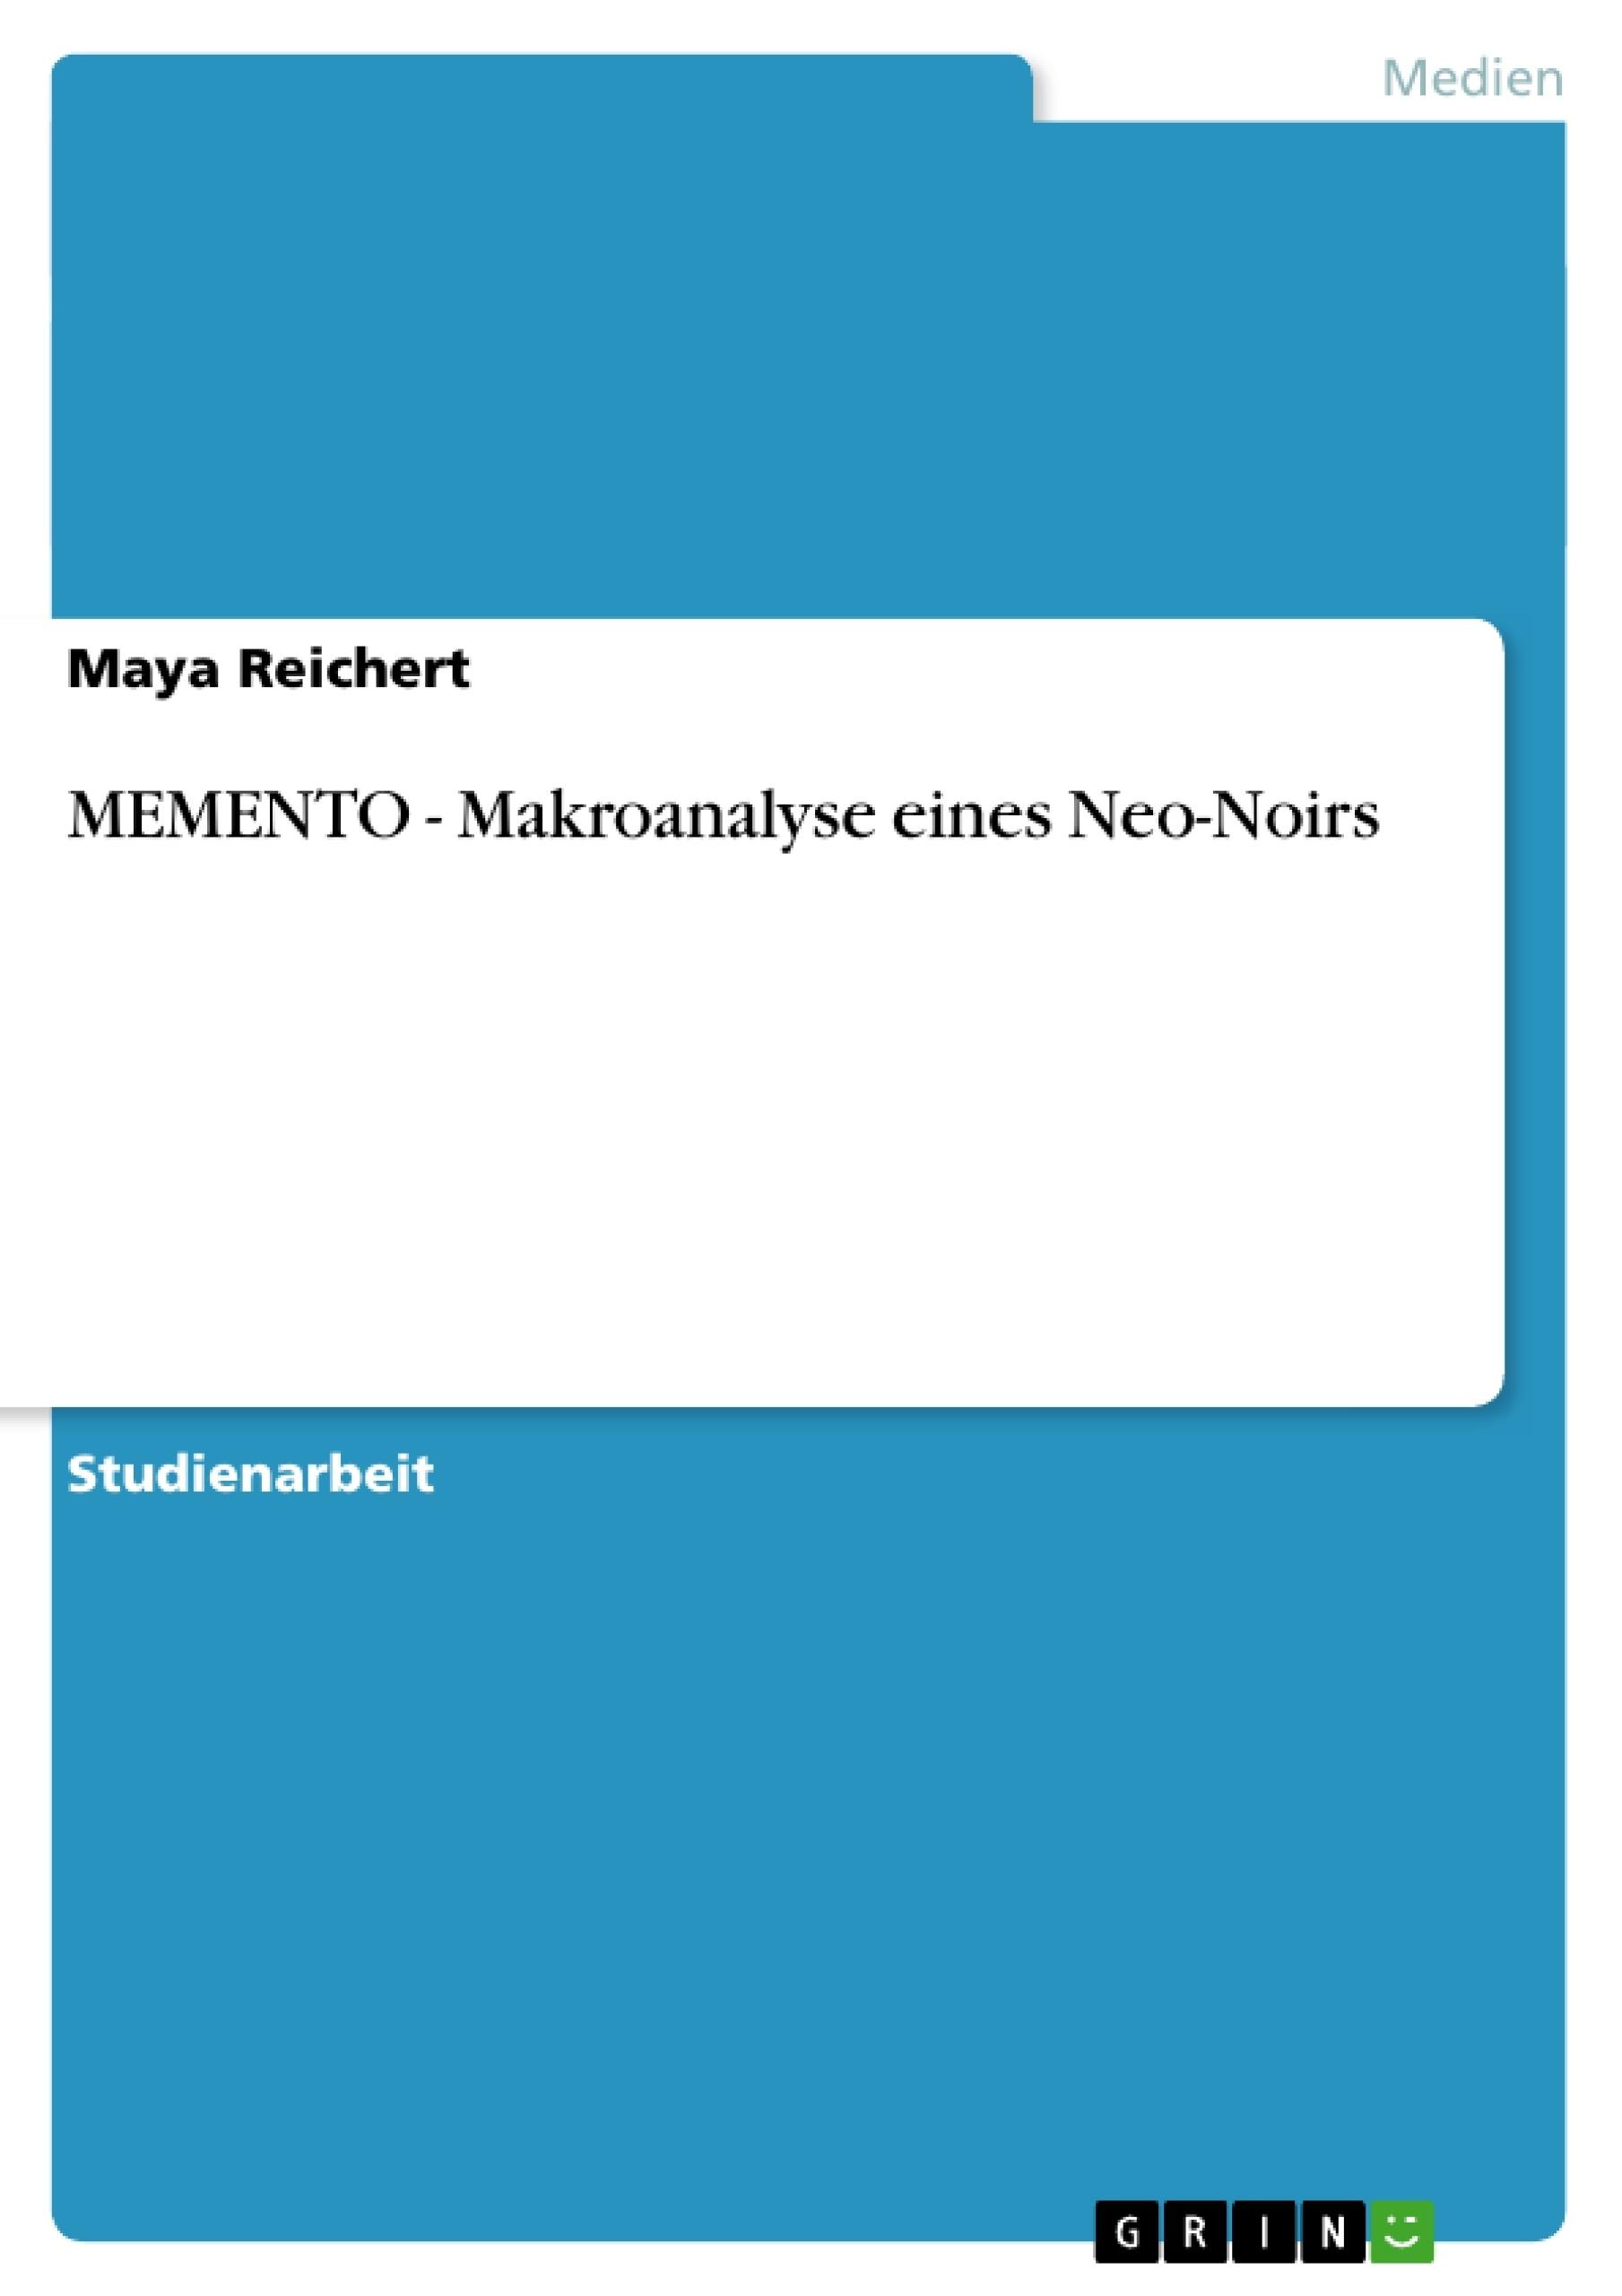 Titel: MEMENTO  - Makroanalyse eines Neo-Noirs